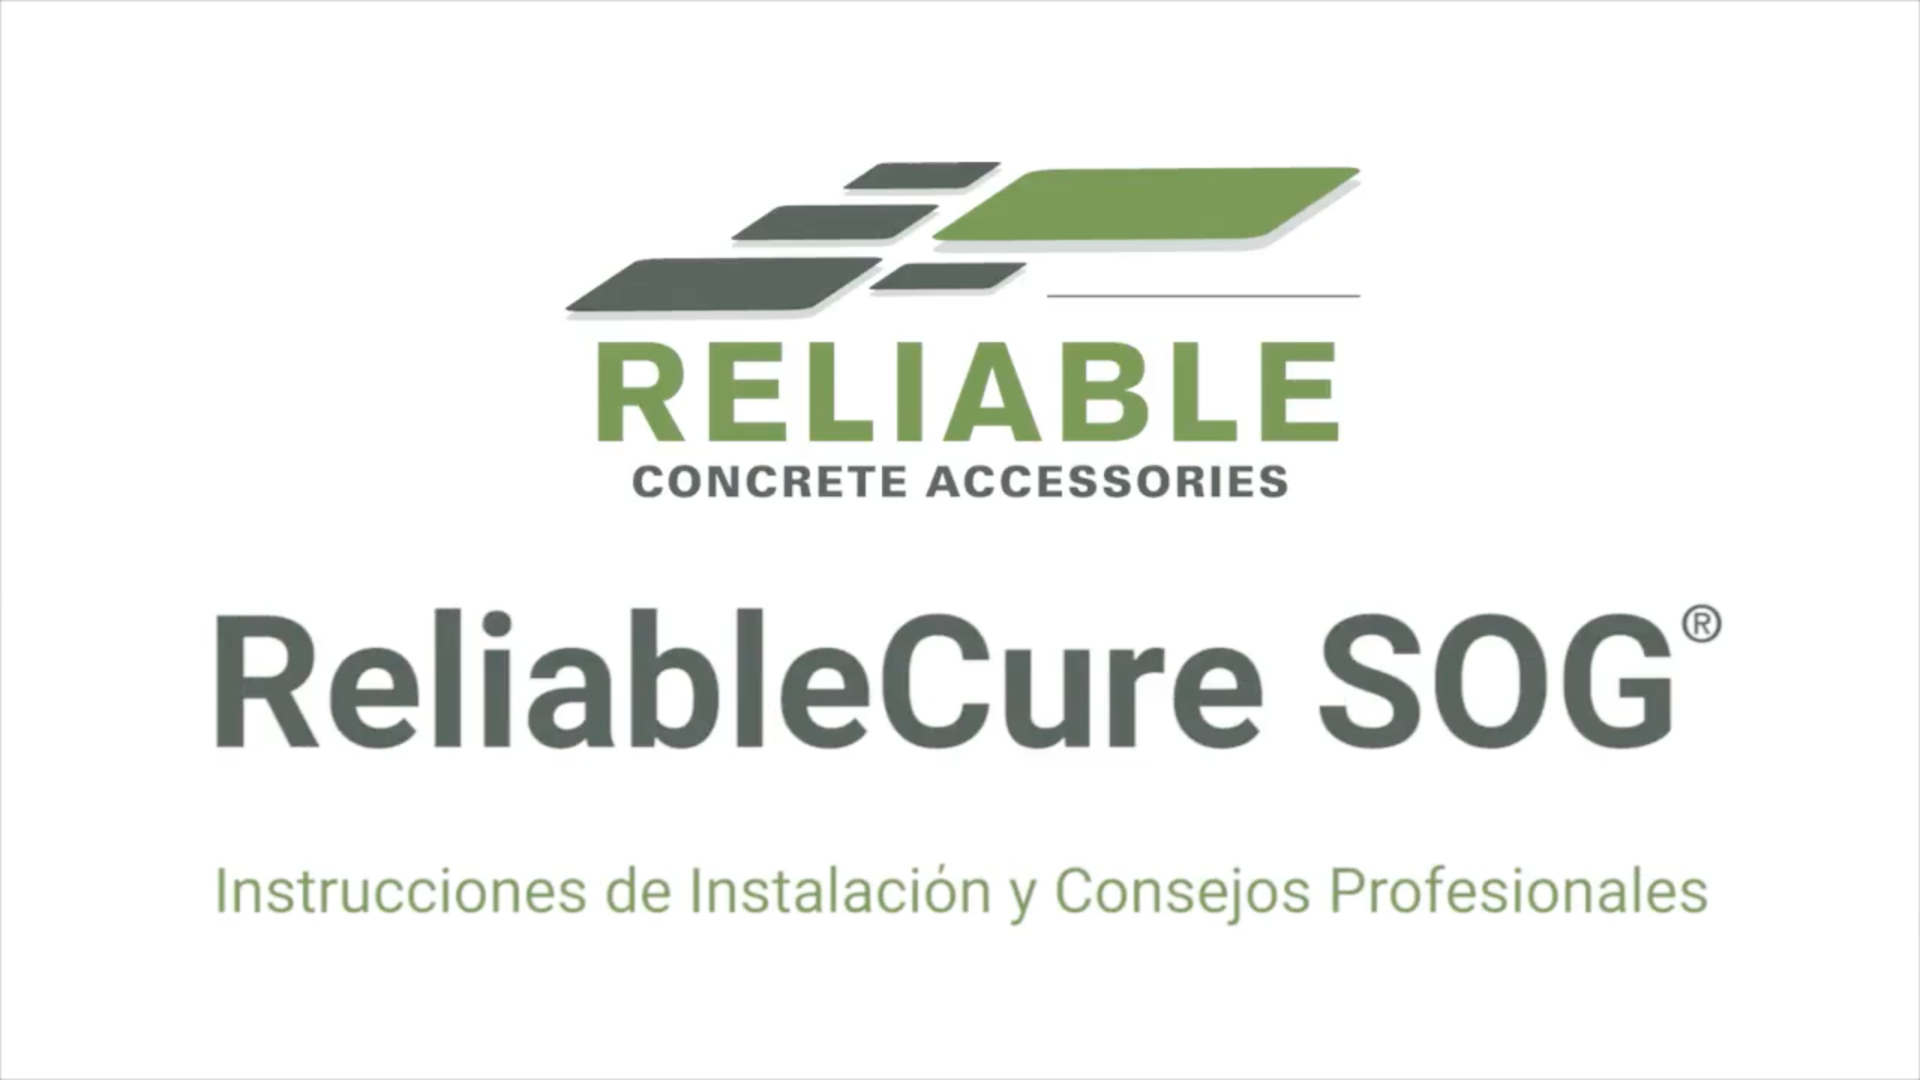 ReliableCure SOG